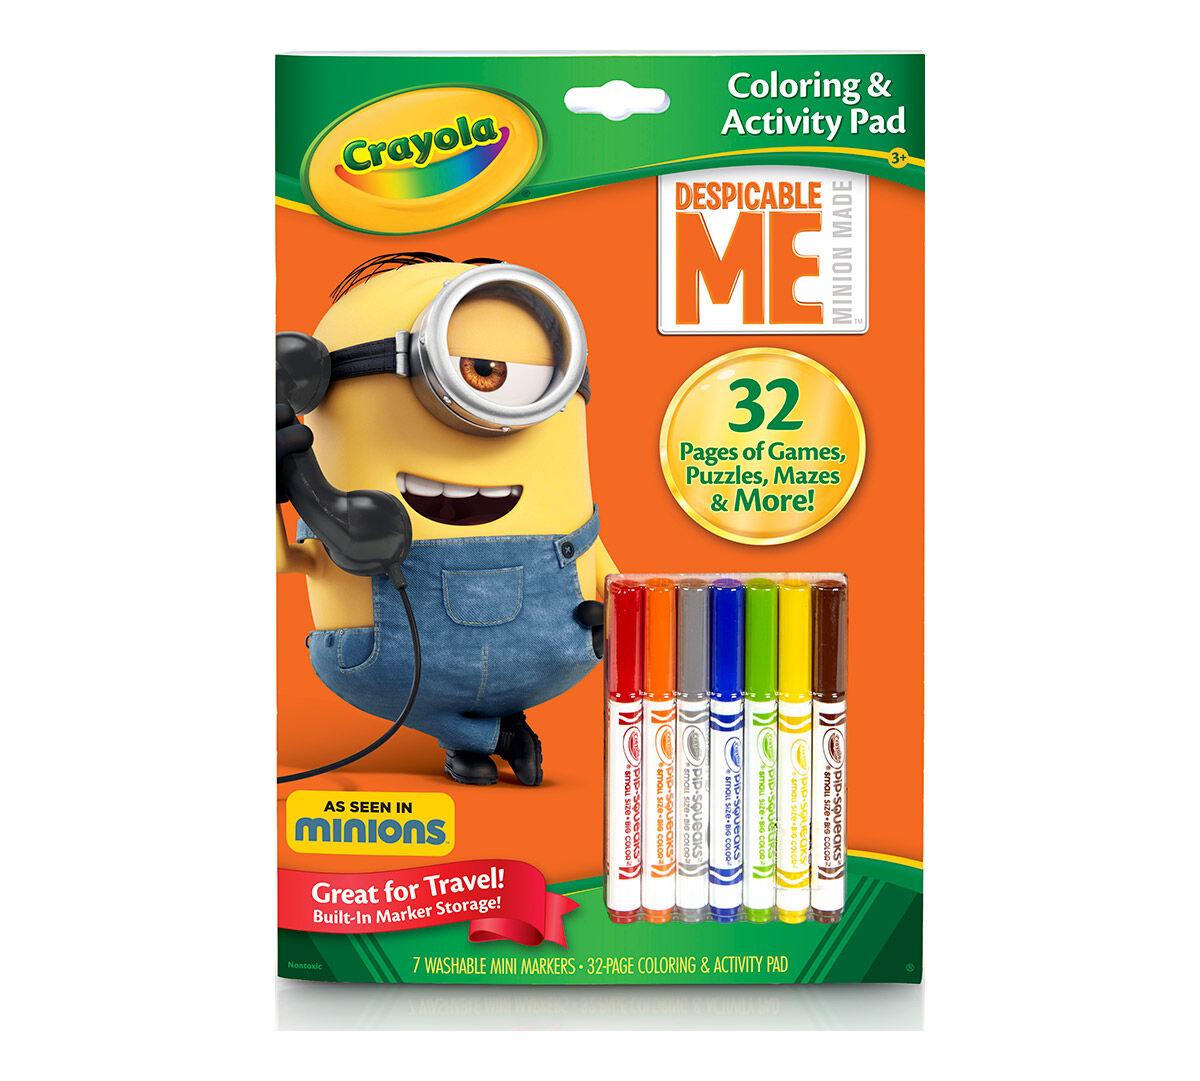 Crayola Coloring & Activity Book, Despicable Me , featuring Minions ...